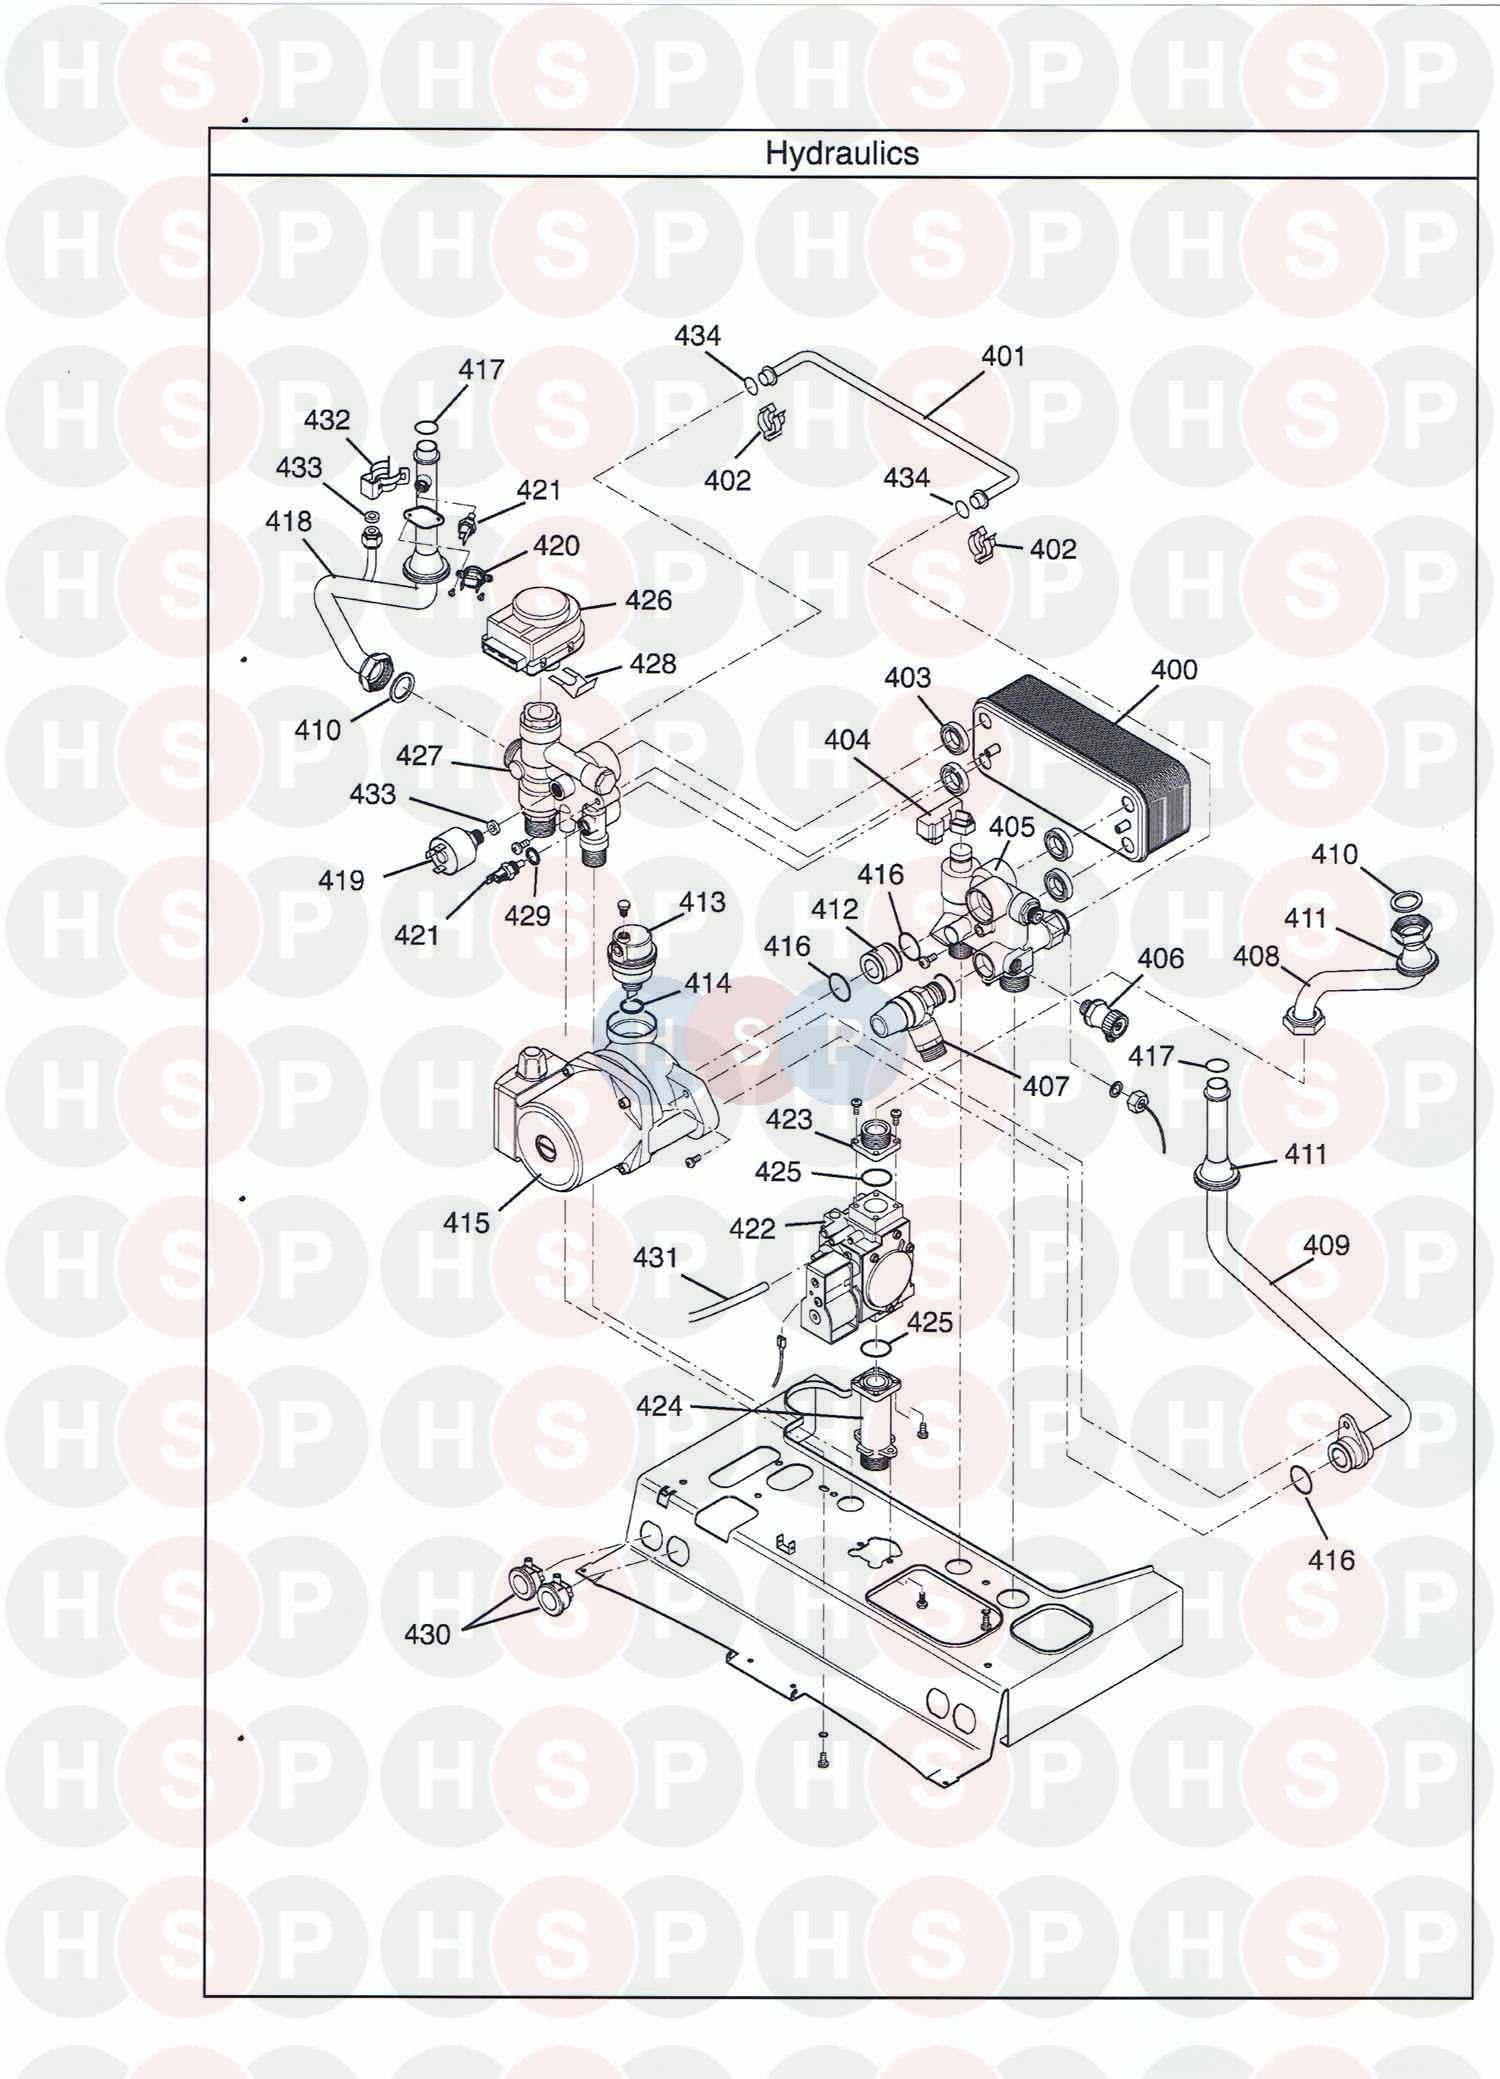 Baxi Duo Tec 28 He  Hydraulics  Diagram